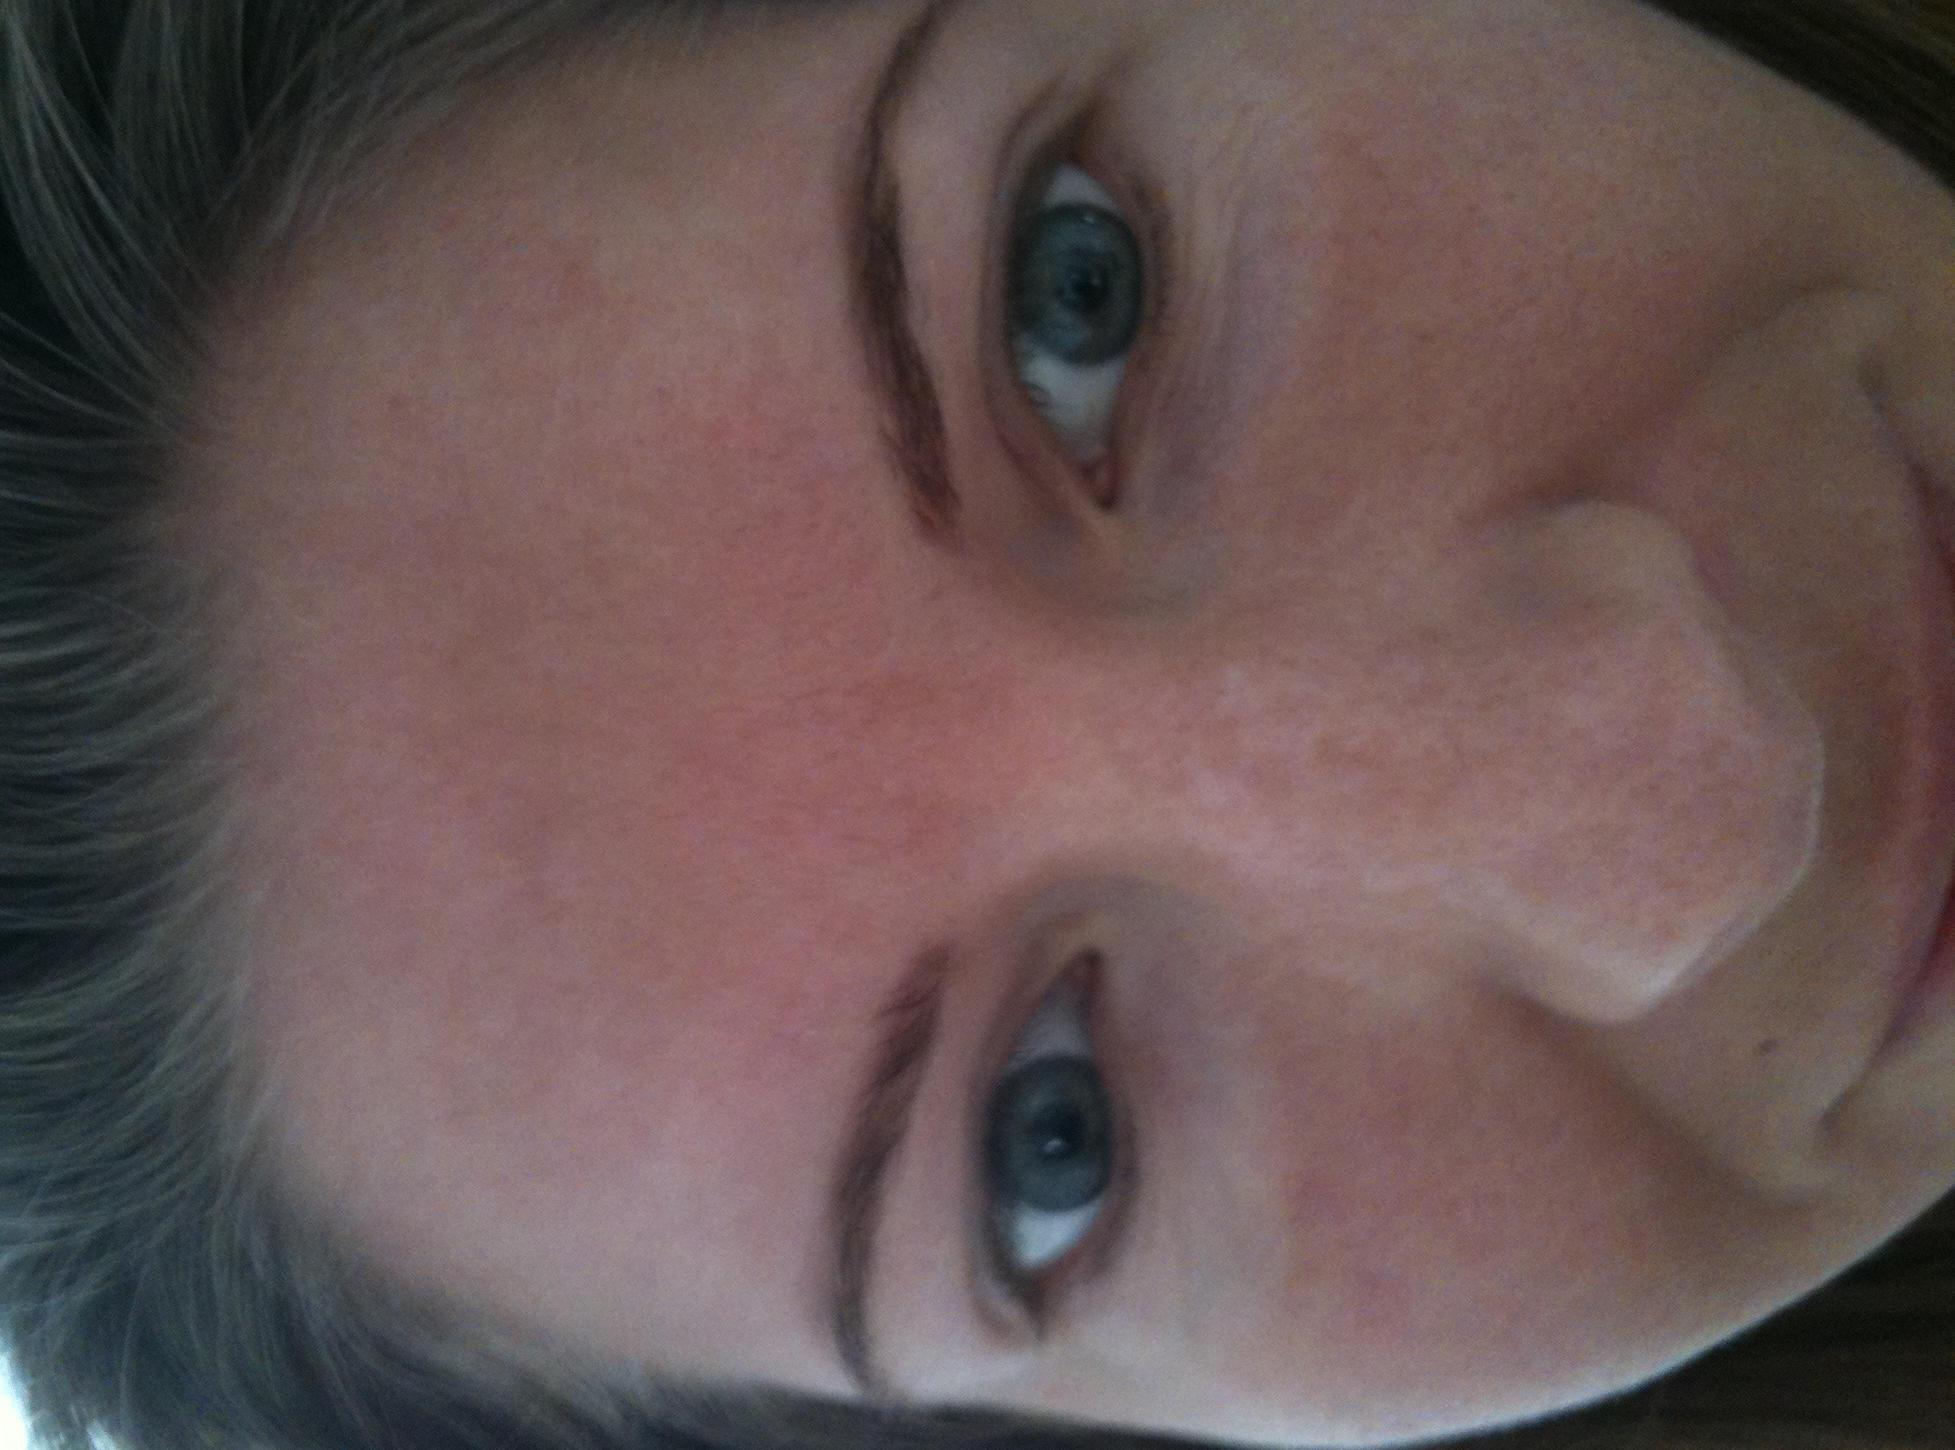 i noticed that i have developed white marks under my eyes